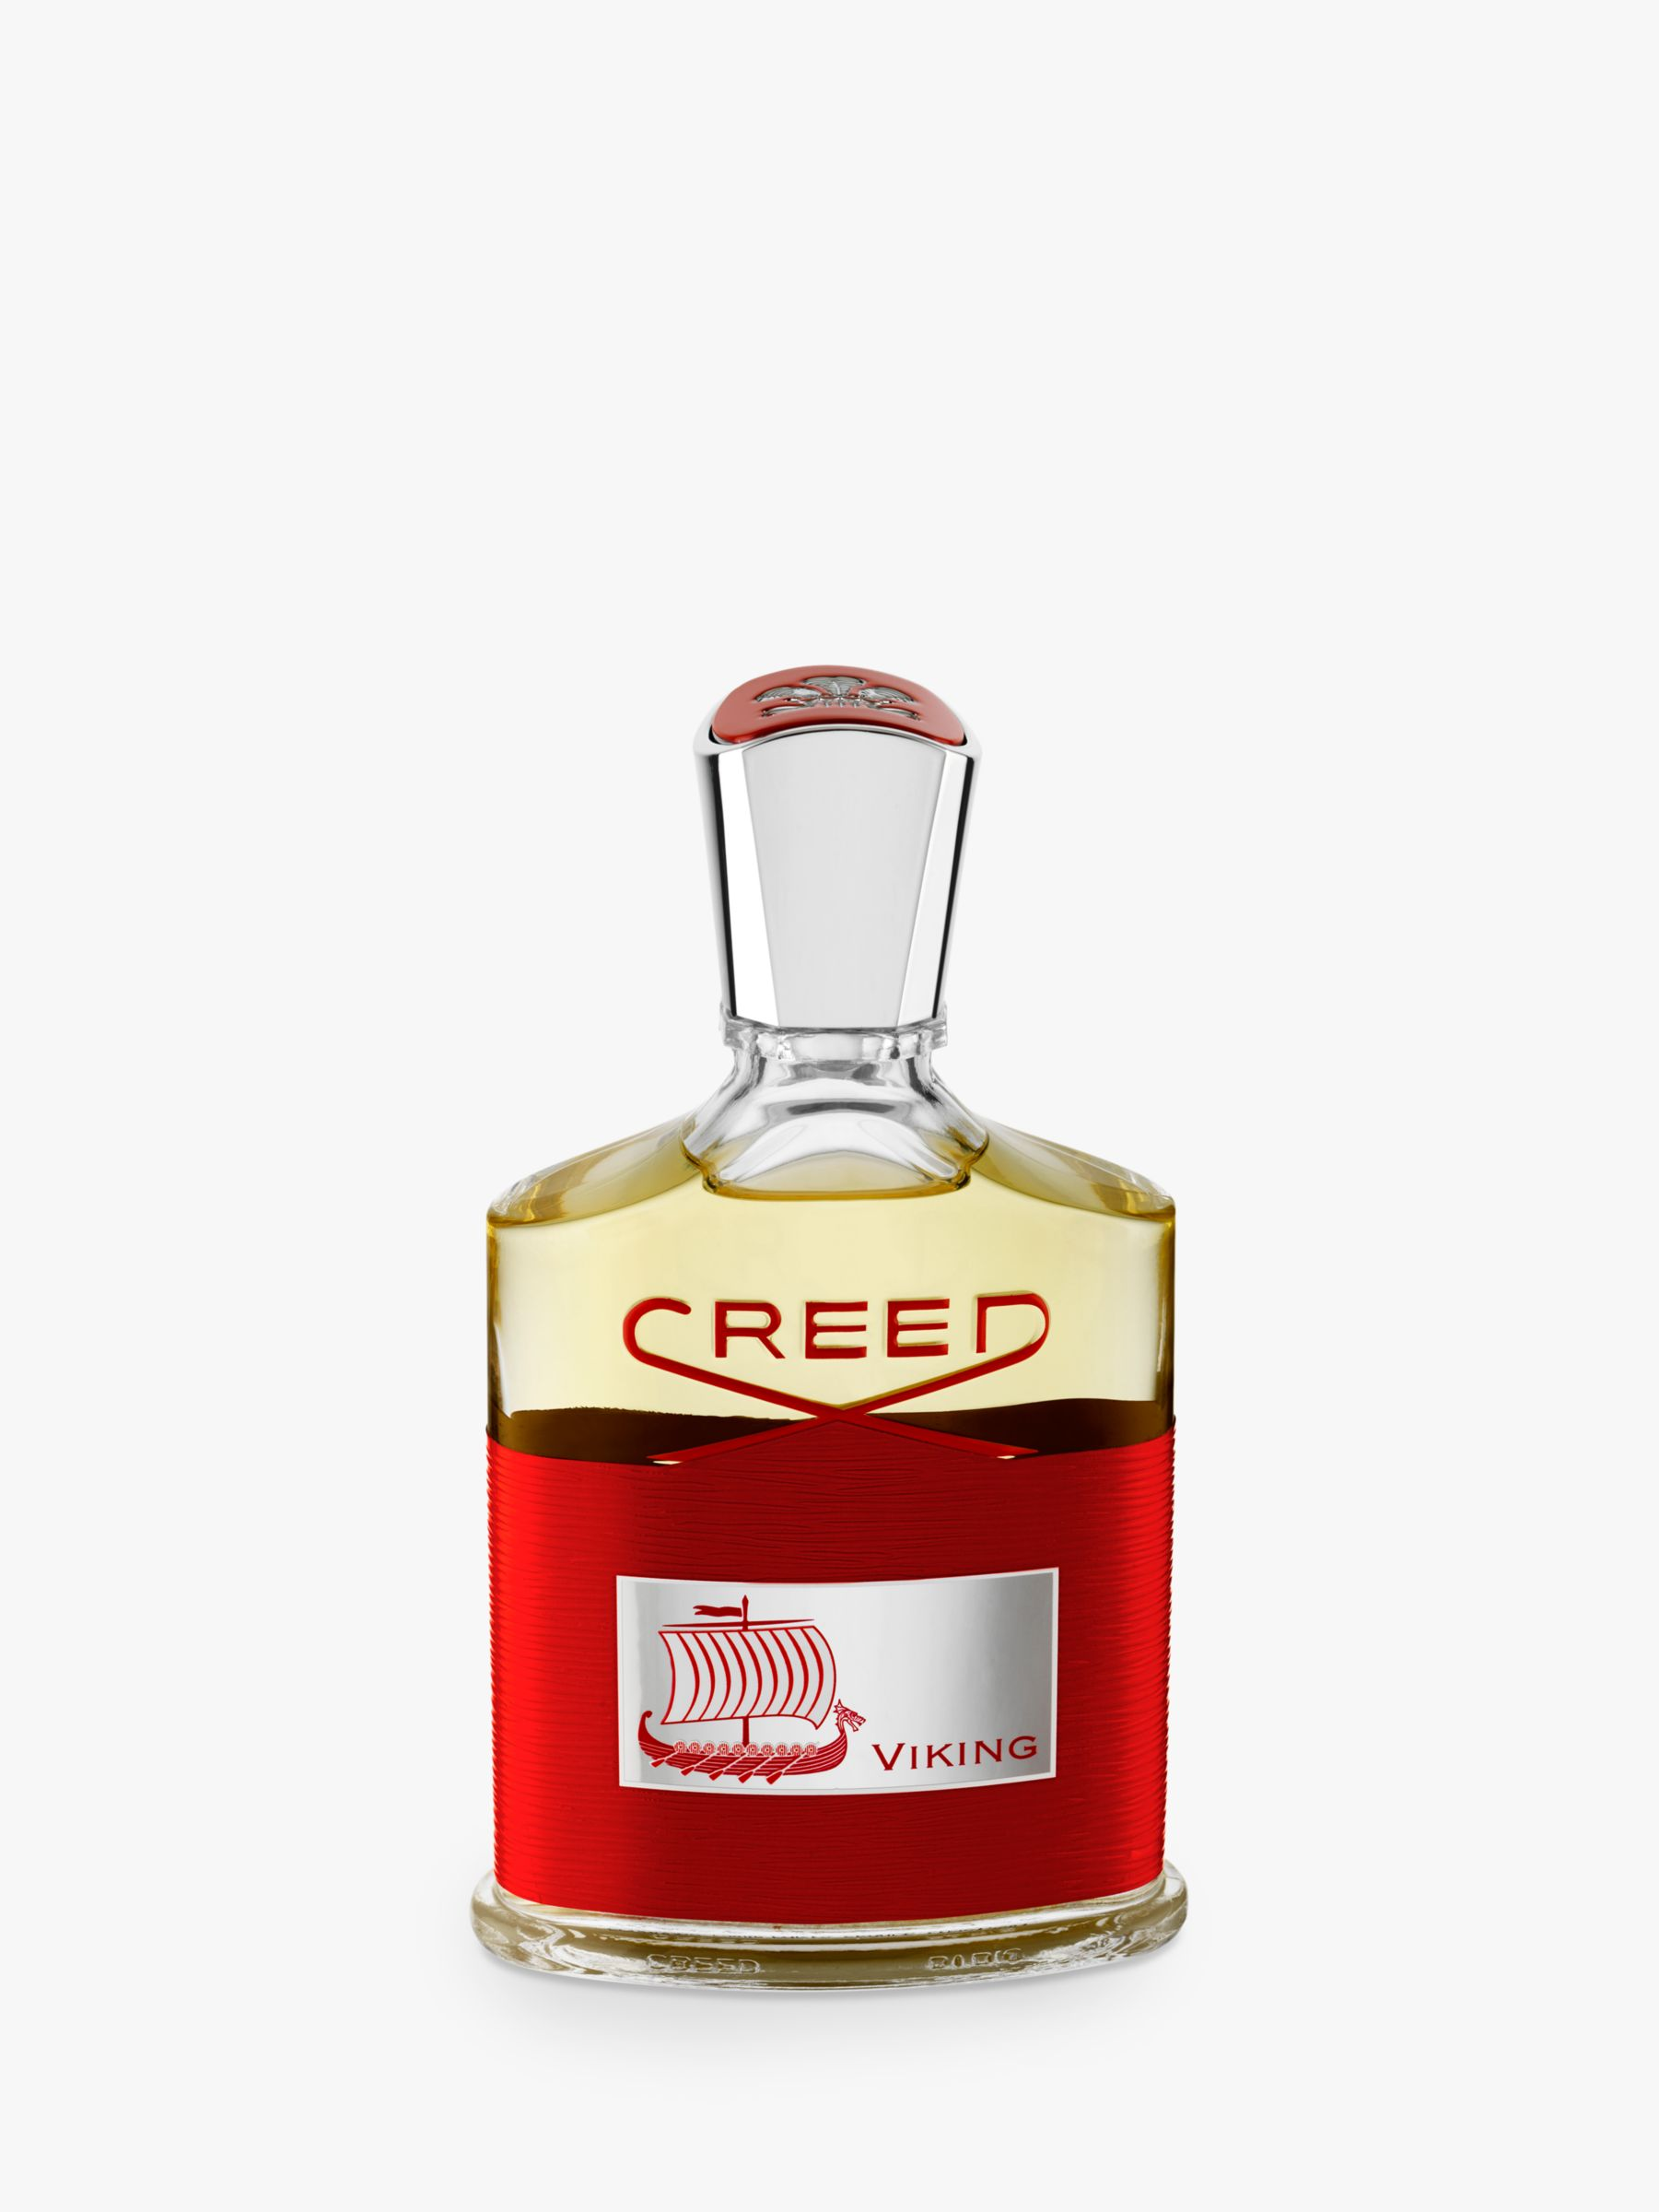 Creed CREED Viking Eau de Parfum, 100ml